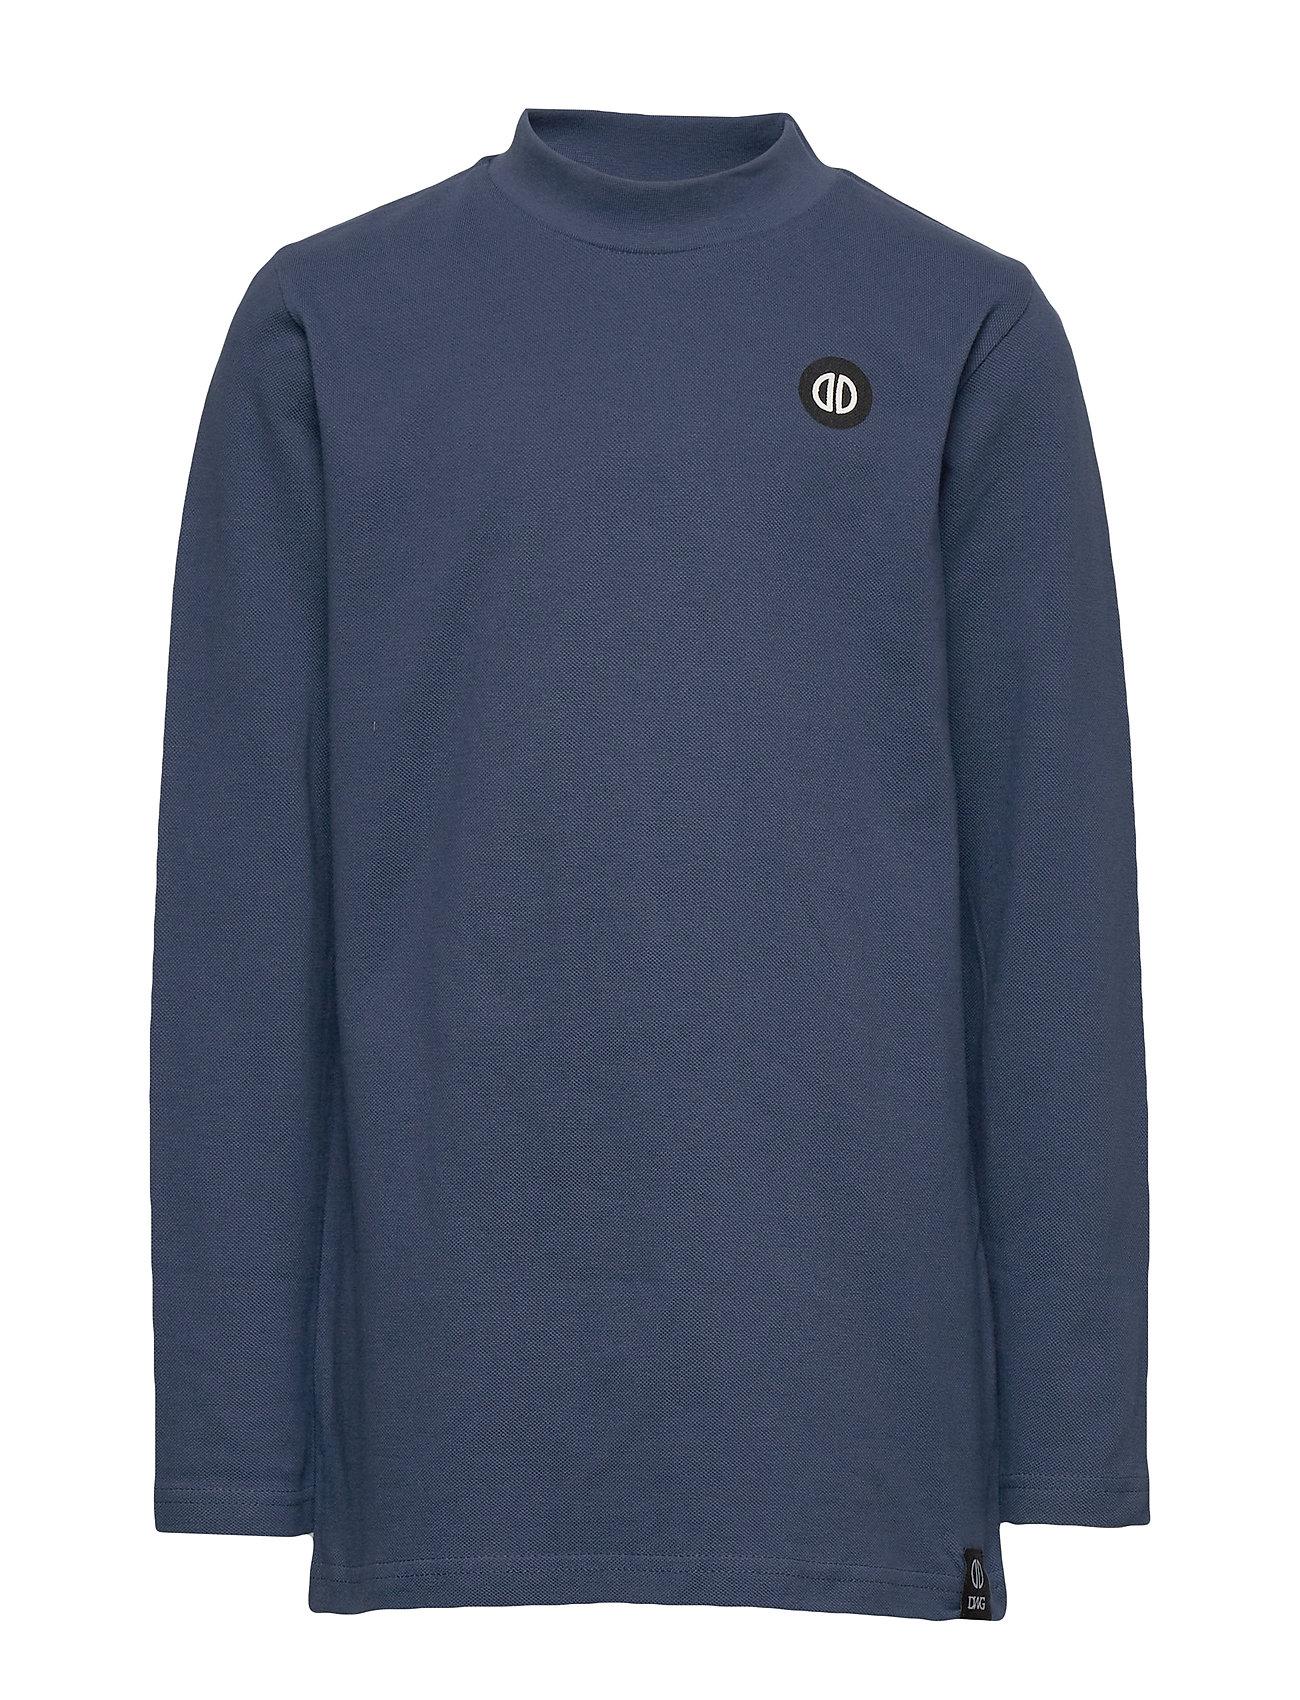 Image of Glover 036 Langærmet T-shirt Blå D-xel (3454941907)